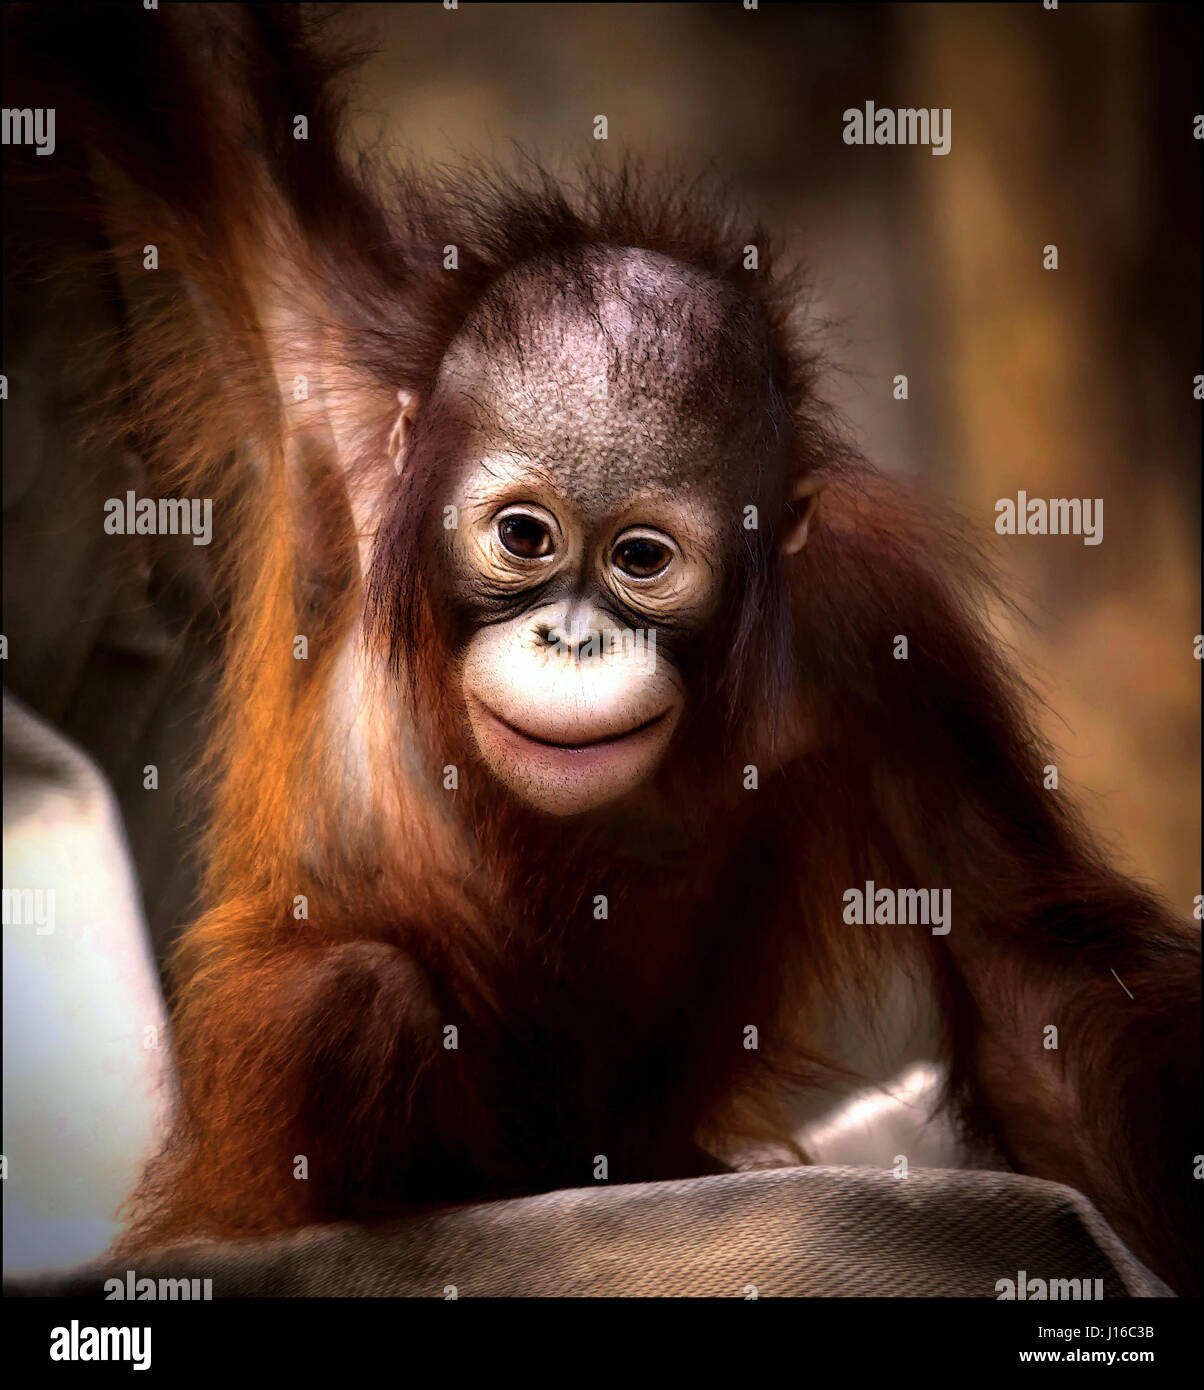 KREFELD ZOO, GERMANY: A baby orangutan smiles at the camera